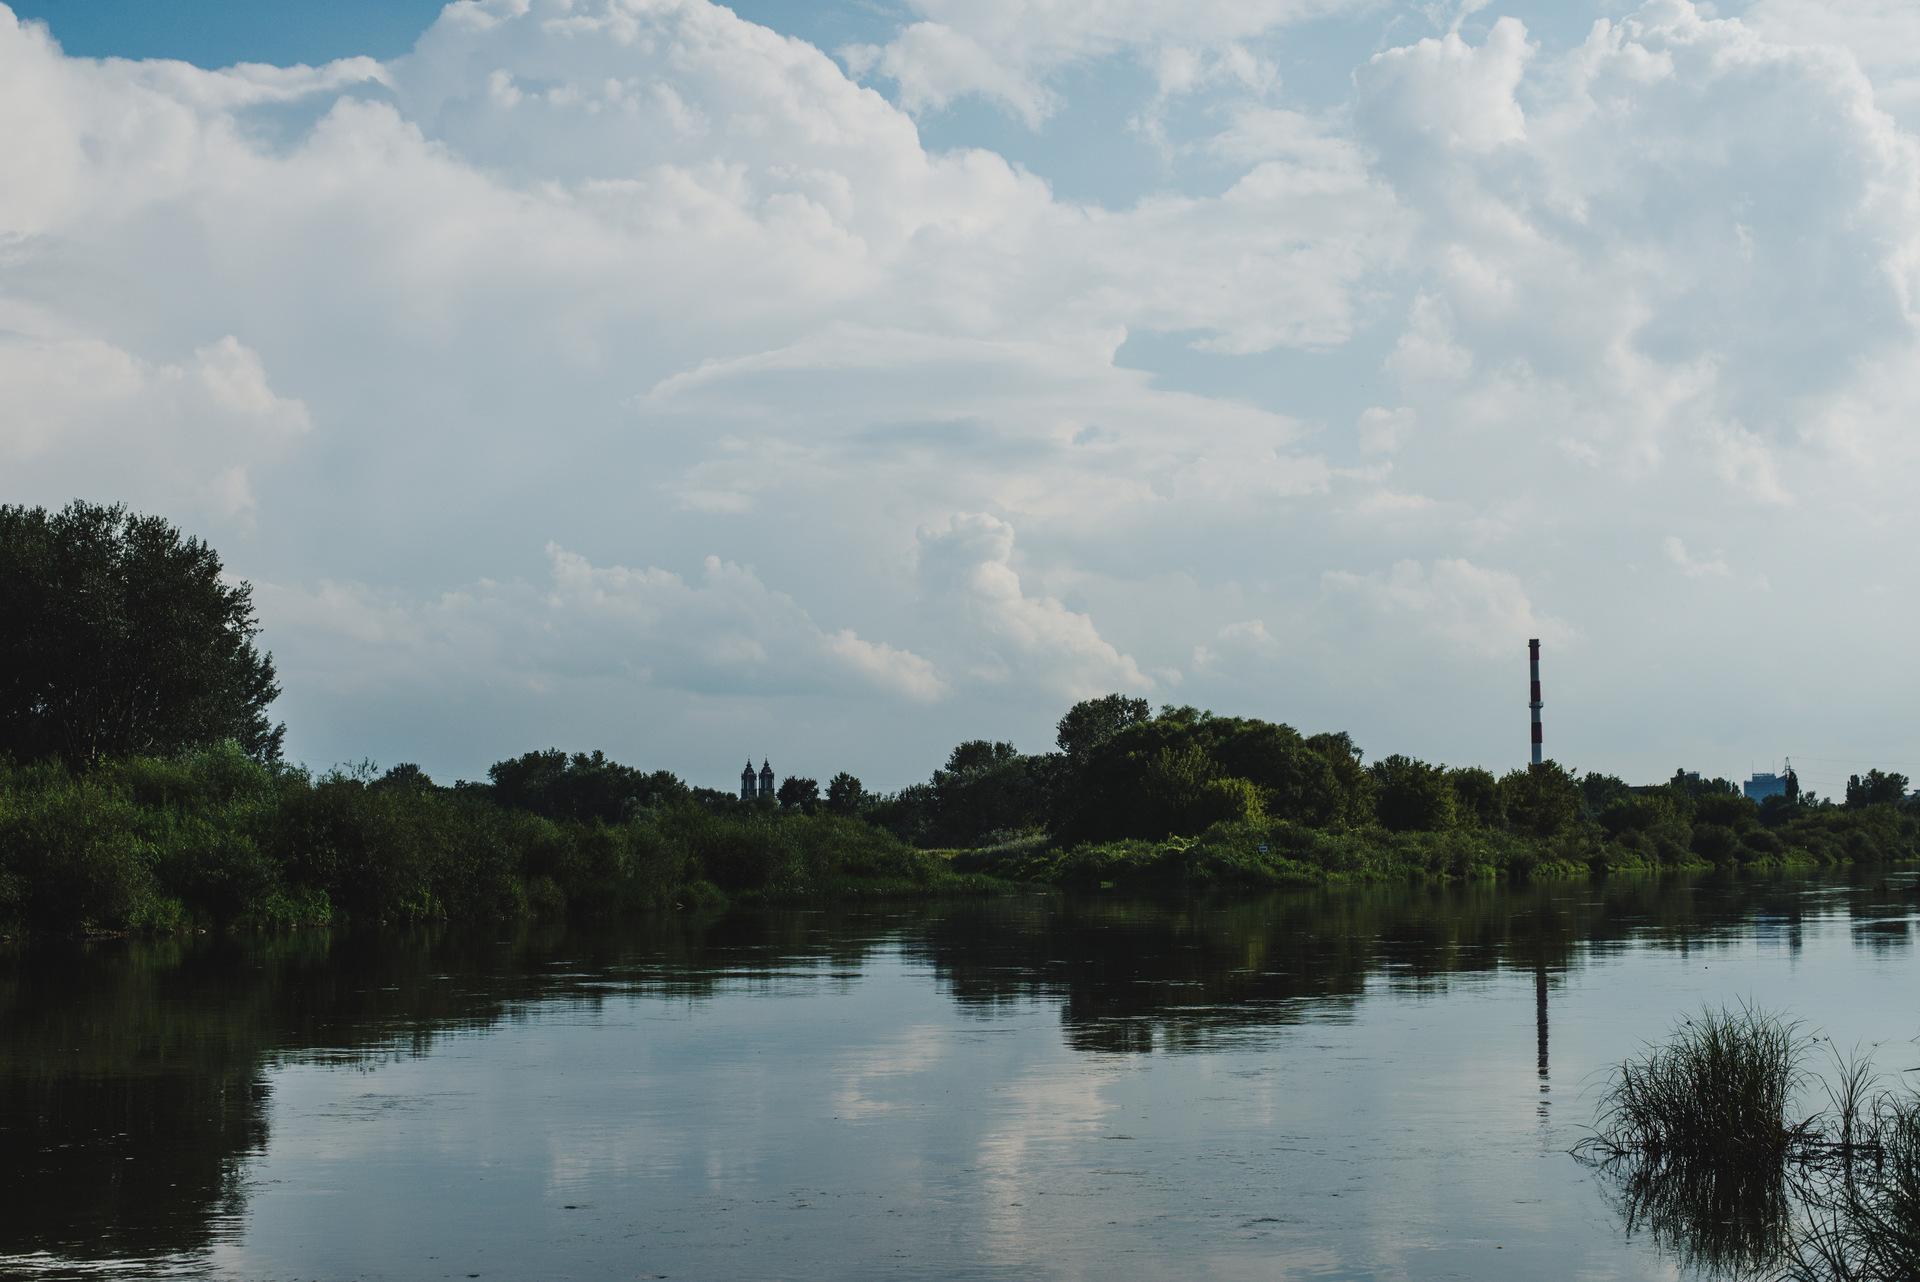 lato w mieście poznań